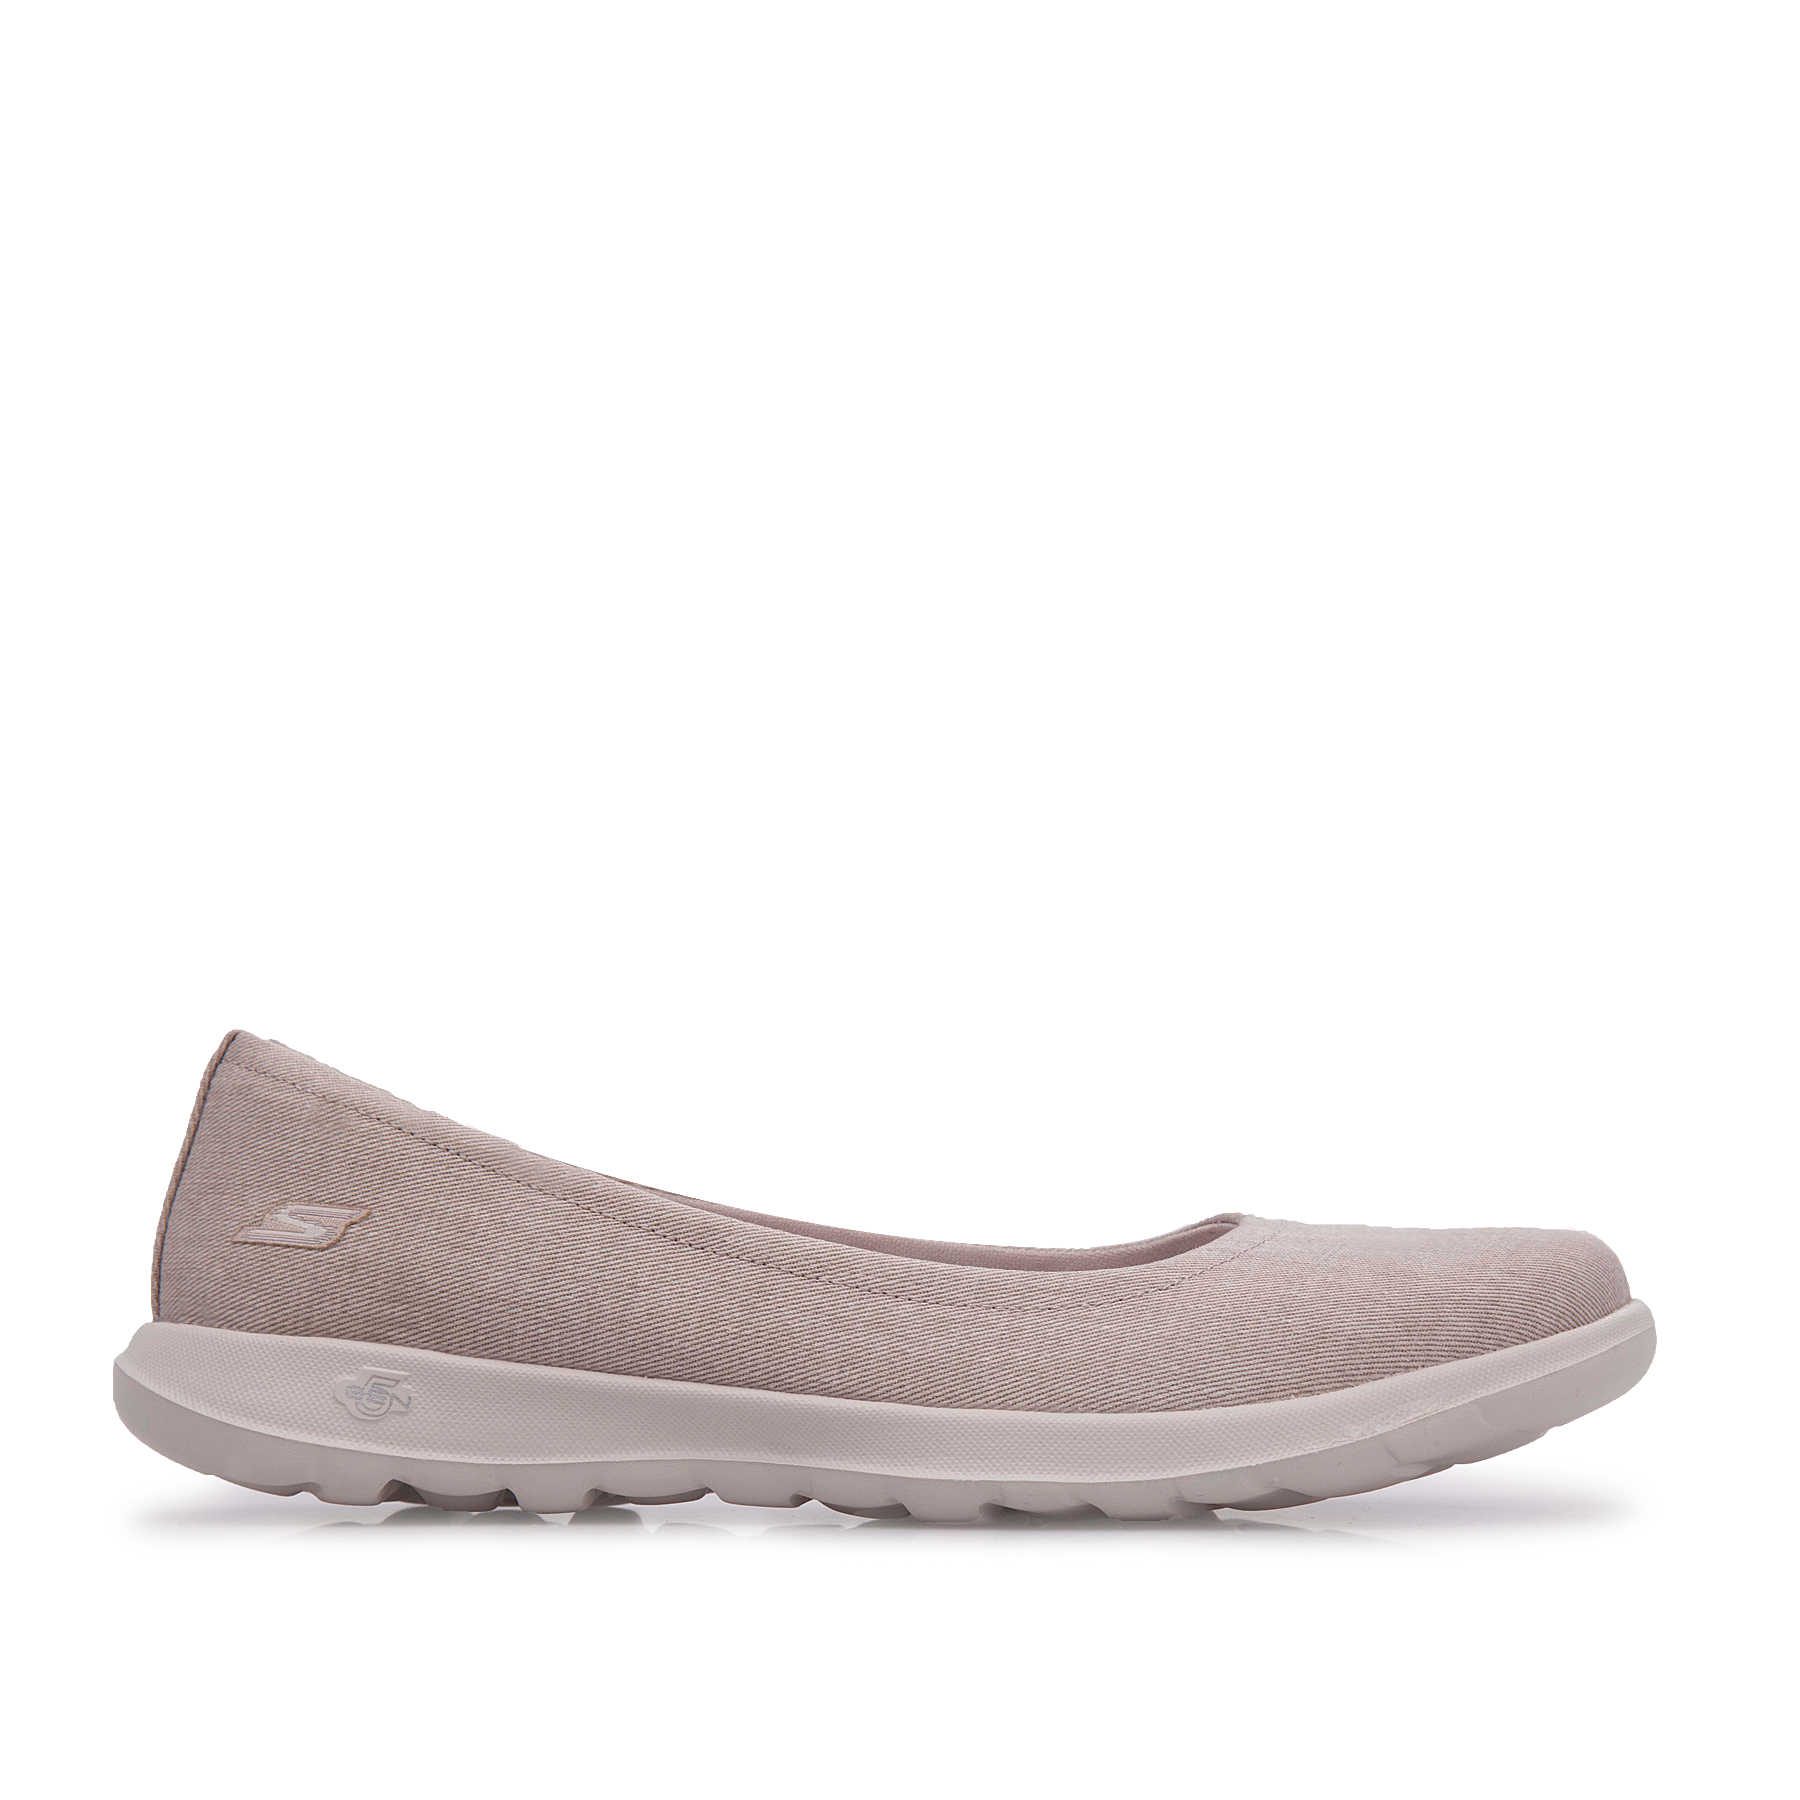 Walk Lite Shoes WOMEN SHOES 15393 TPE